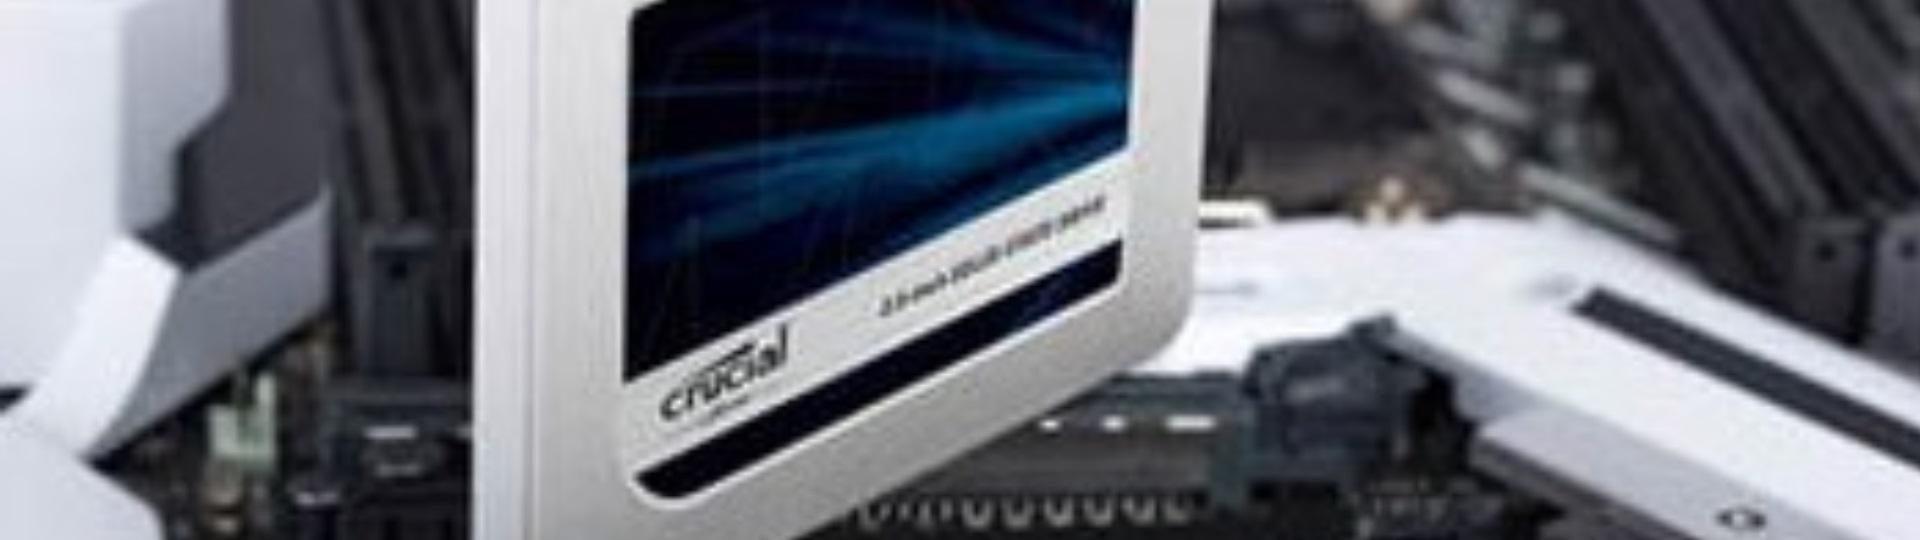 AviUtlにオススメPCスペック:SSD Crucial MX500 CT500MX500SSD1/JP